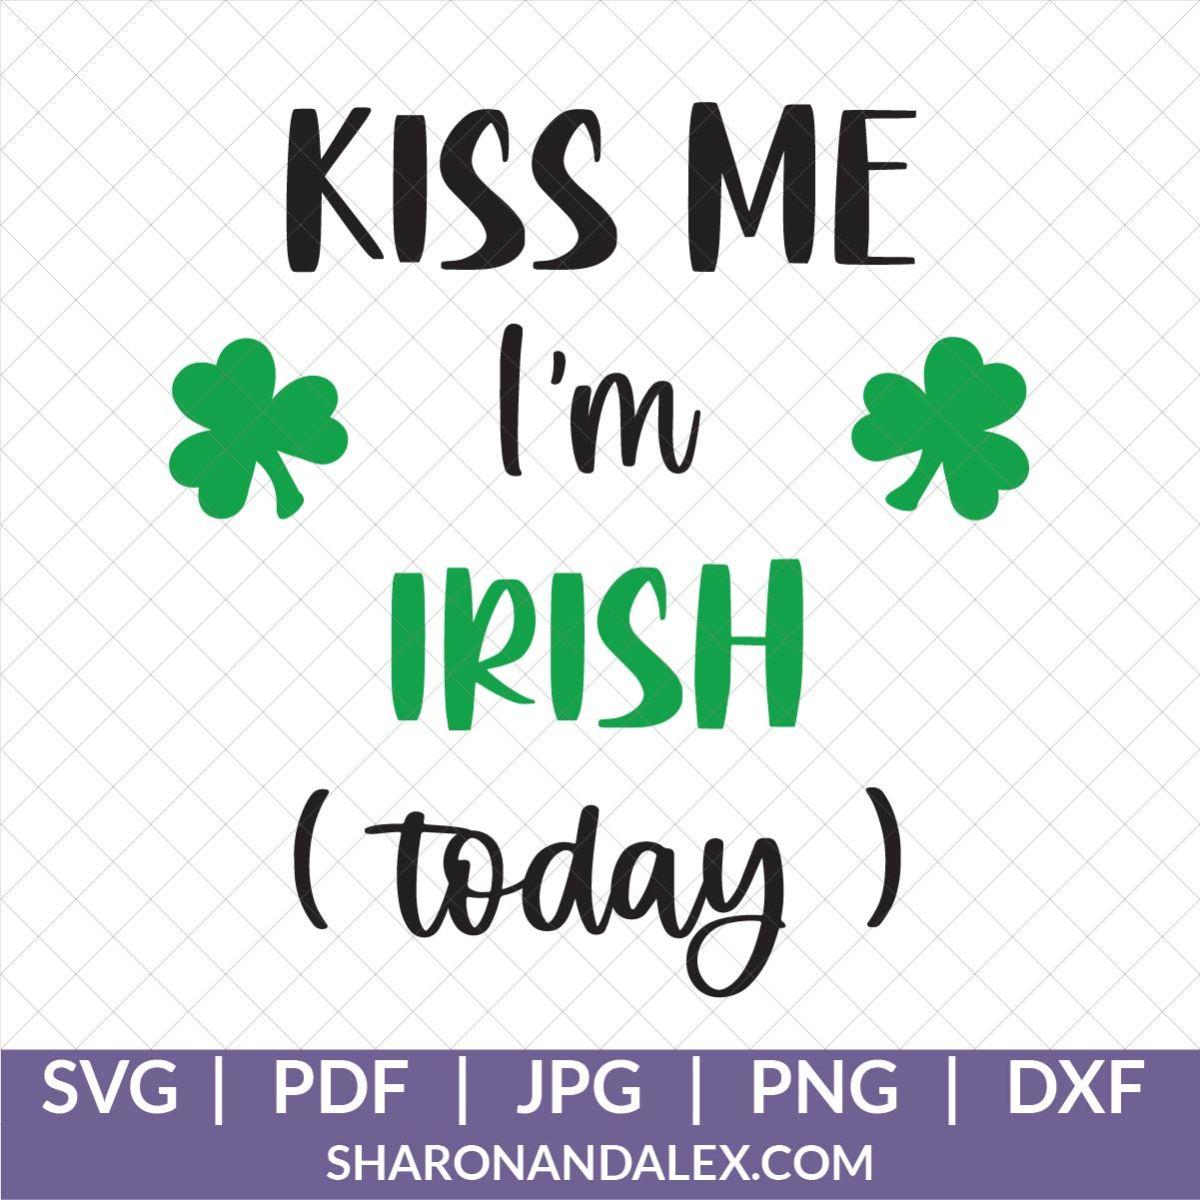 Kiss Me I'm Irish Today